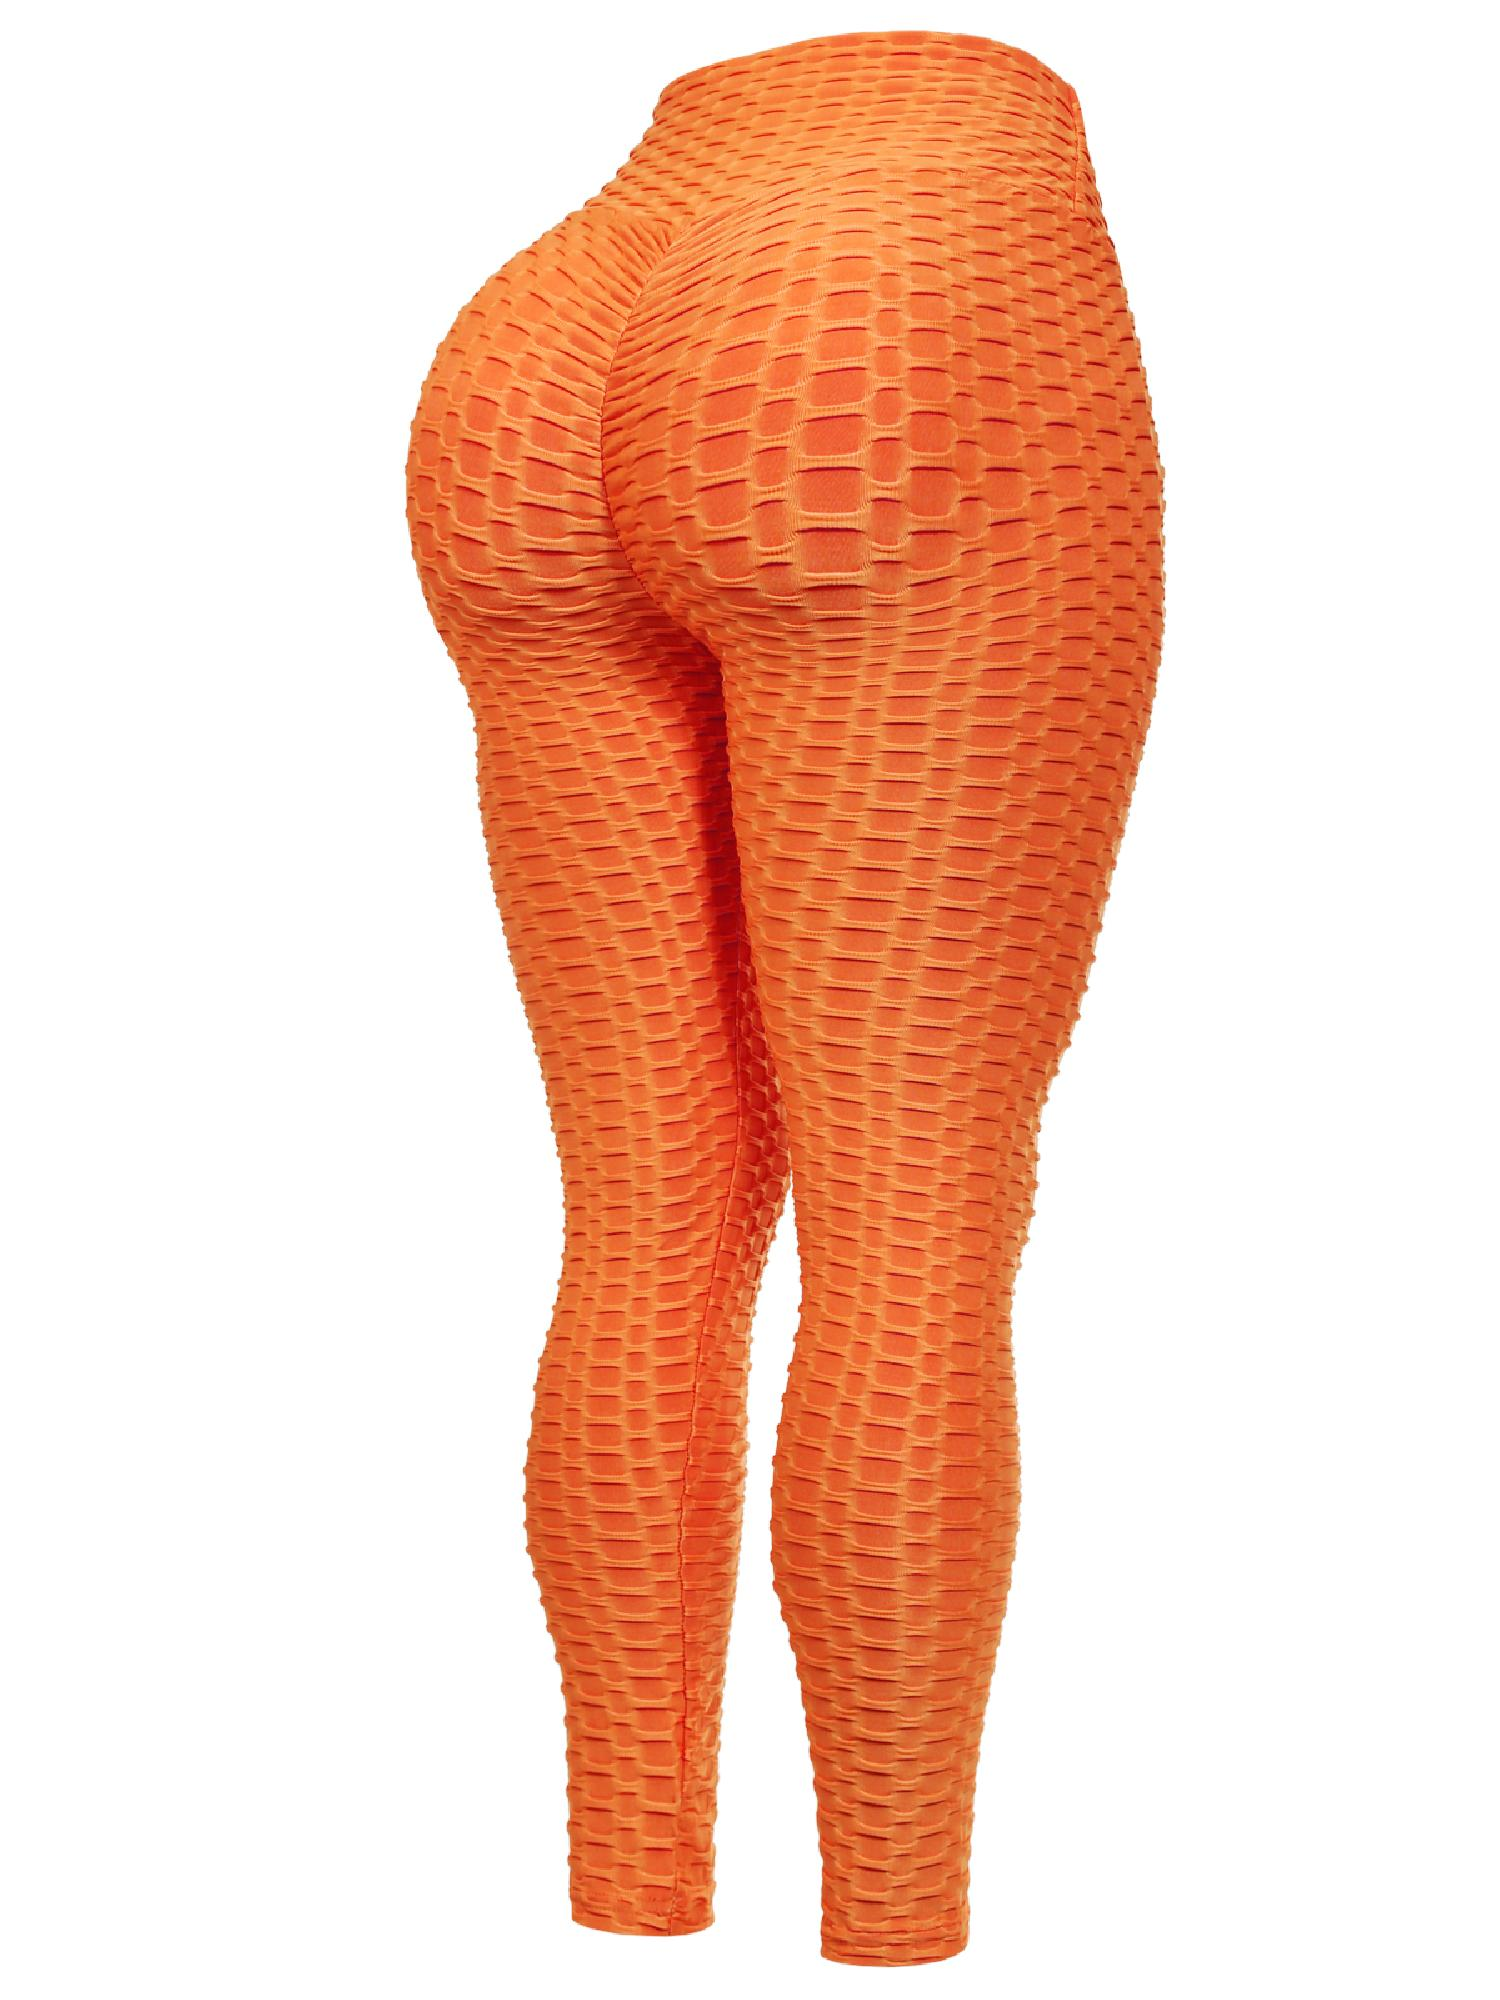 MixMatchy - MixMatchy Women's High Waist Textured Butt ...